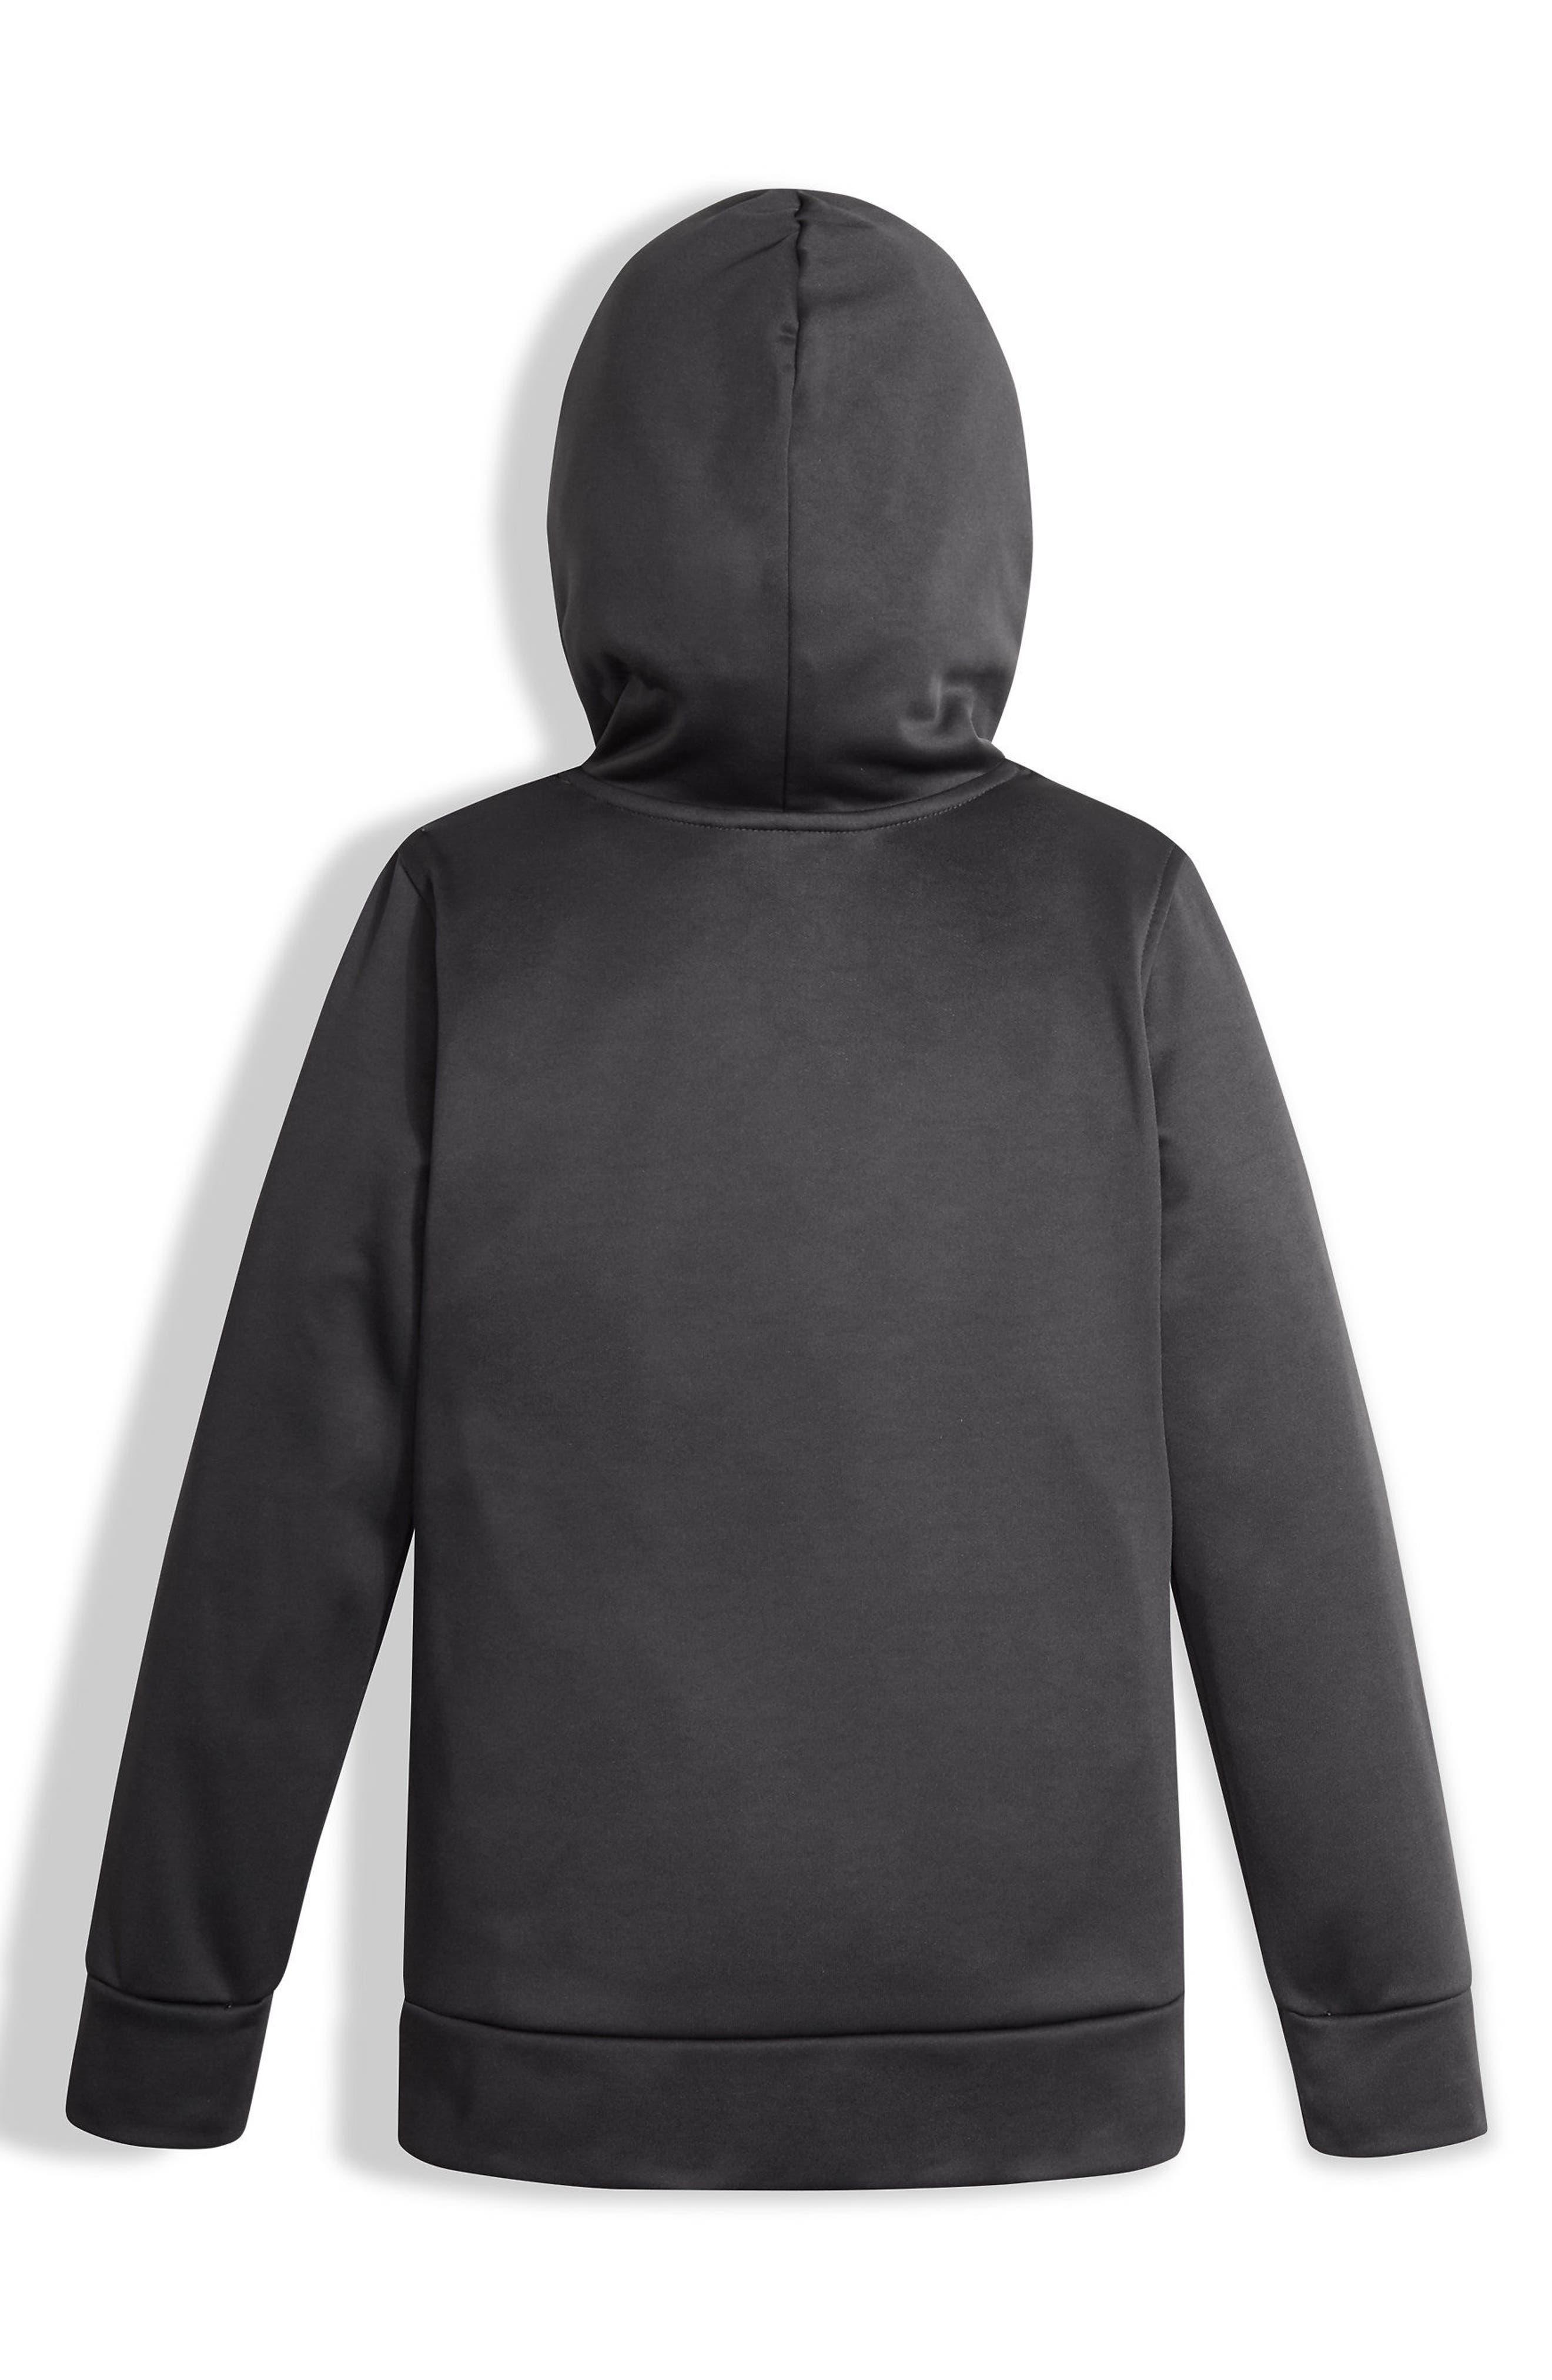 Surgent Fleece Pullover Hoodie,                         Main,                         color,